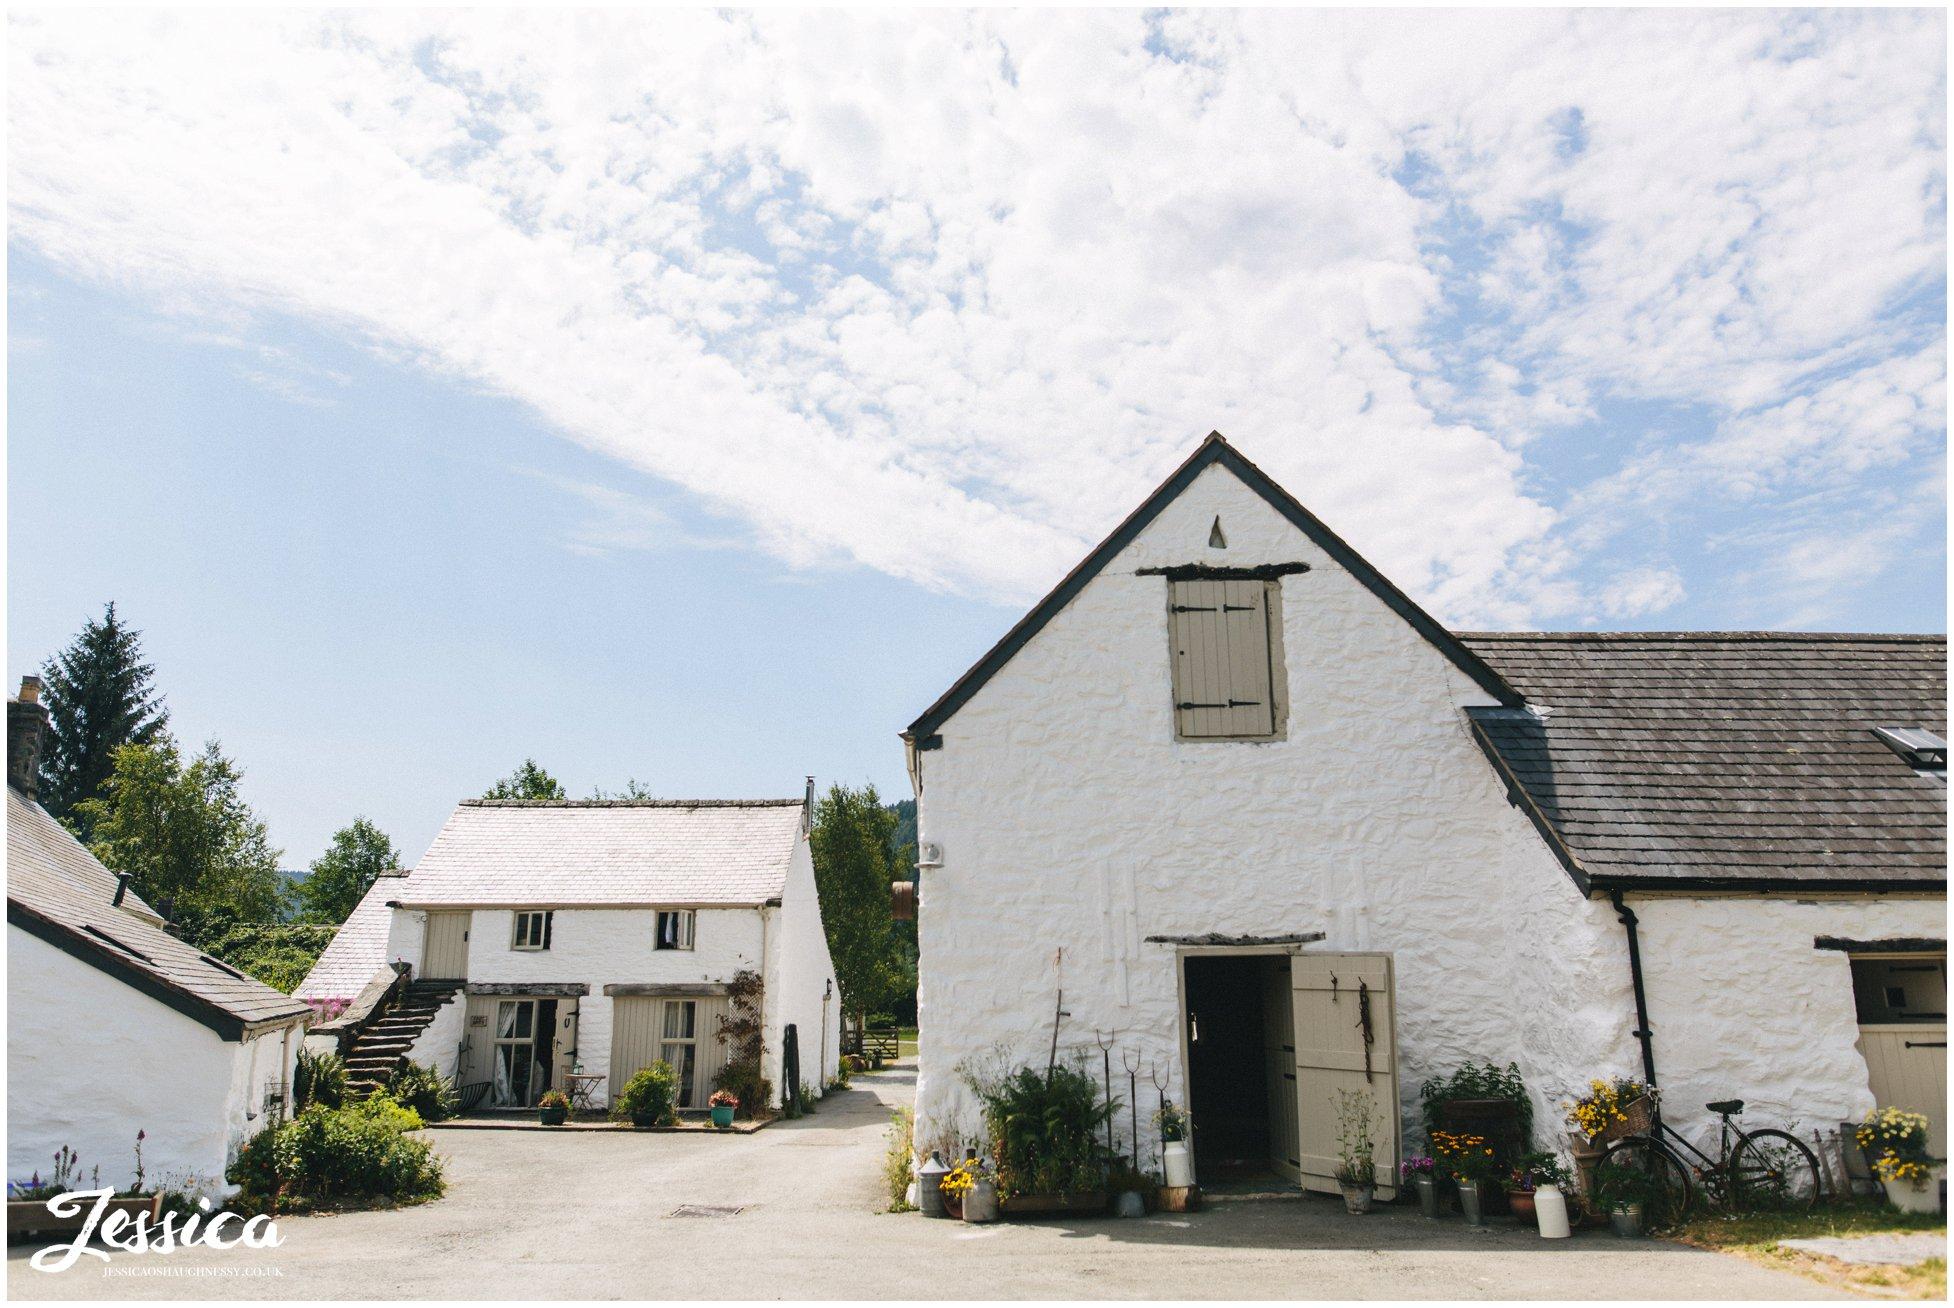 Haford Farm in north wales on a sunny day